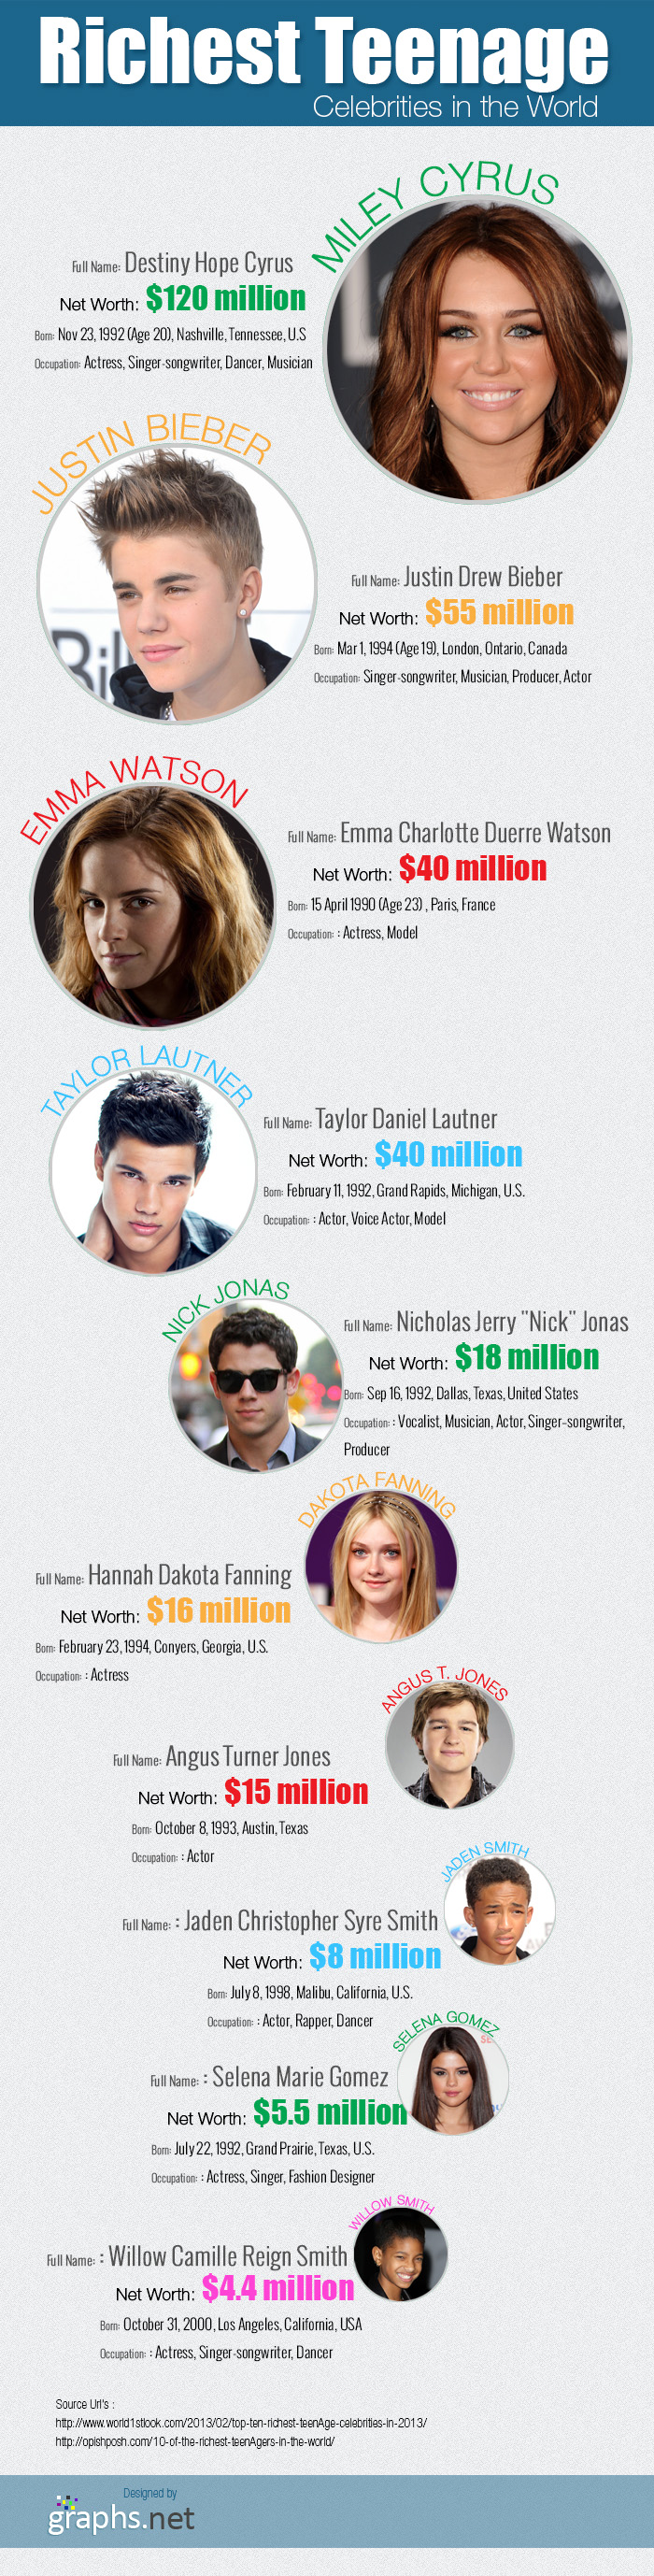 Richest Teenage Celebrities in the World